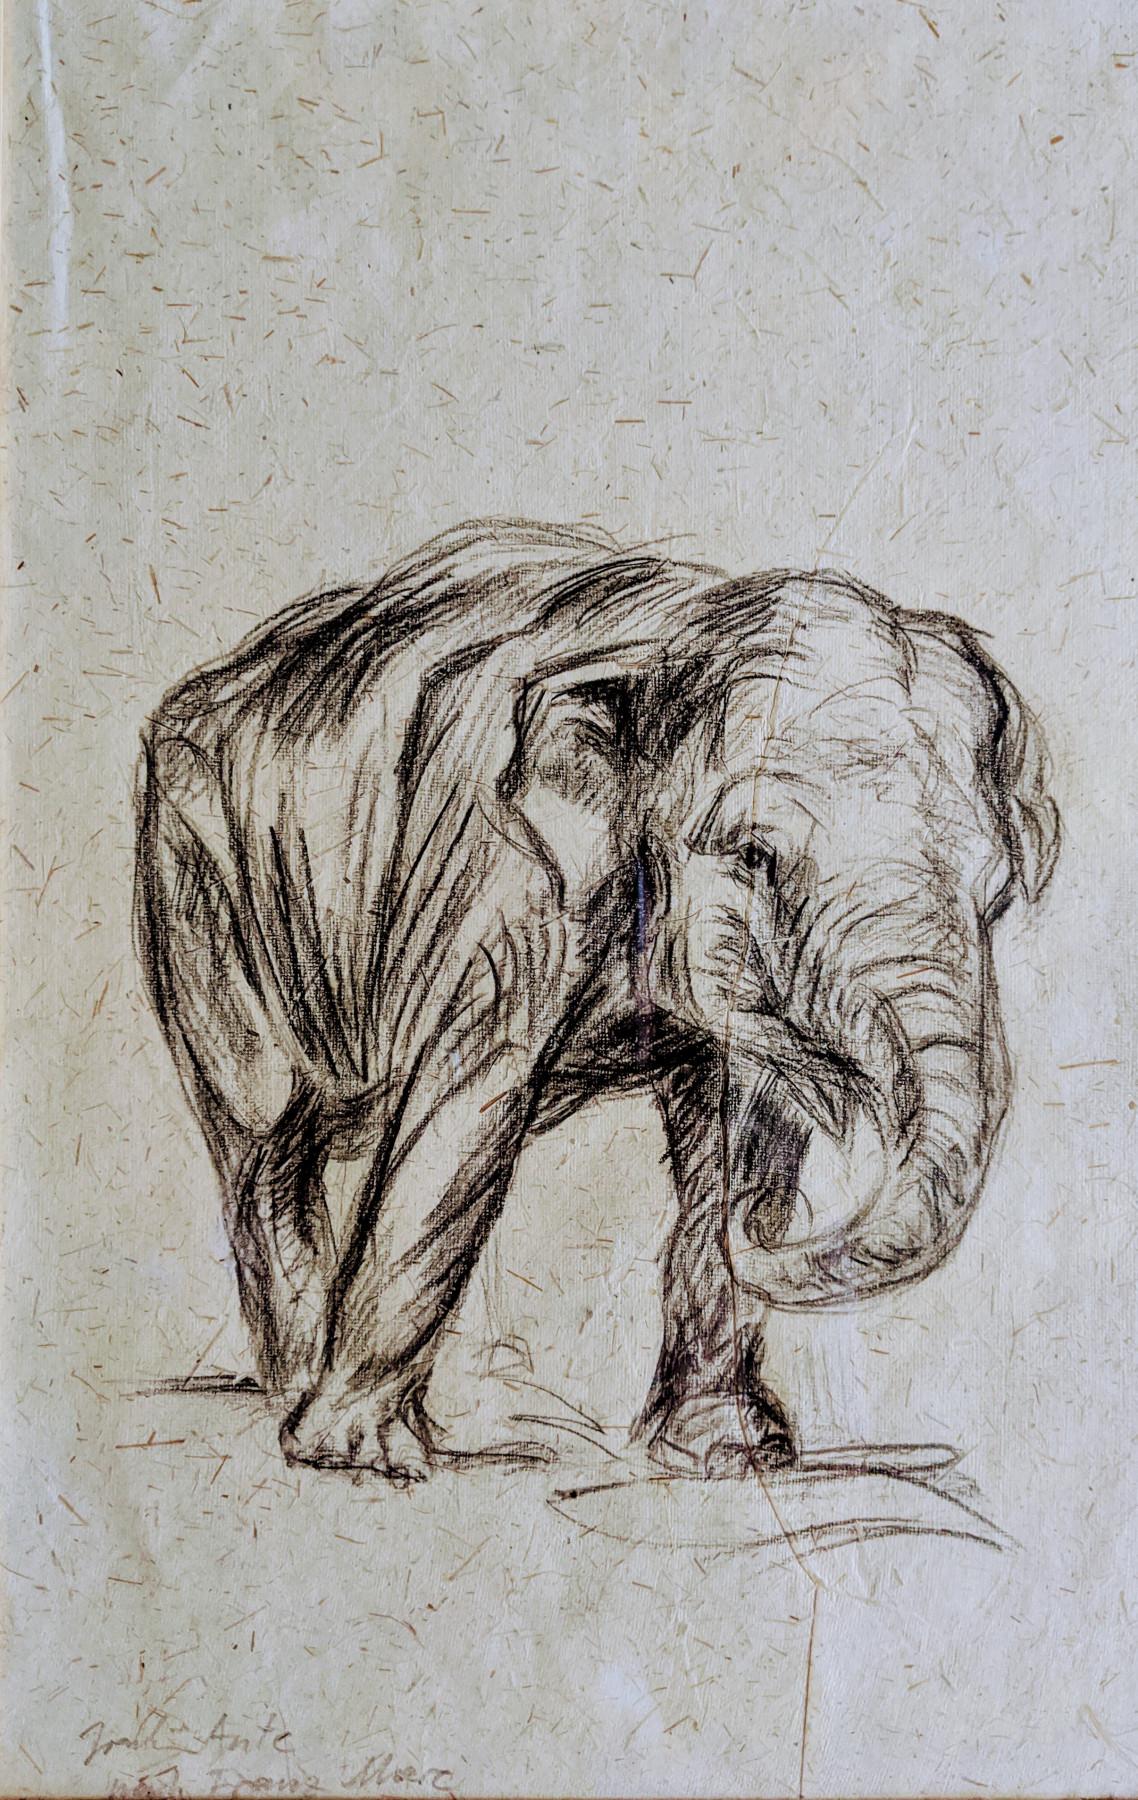 Elefant, Datum unbekannt